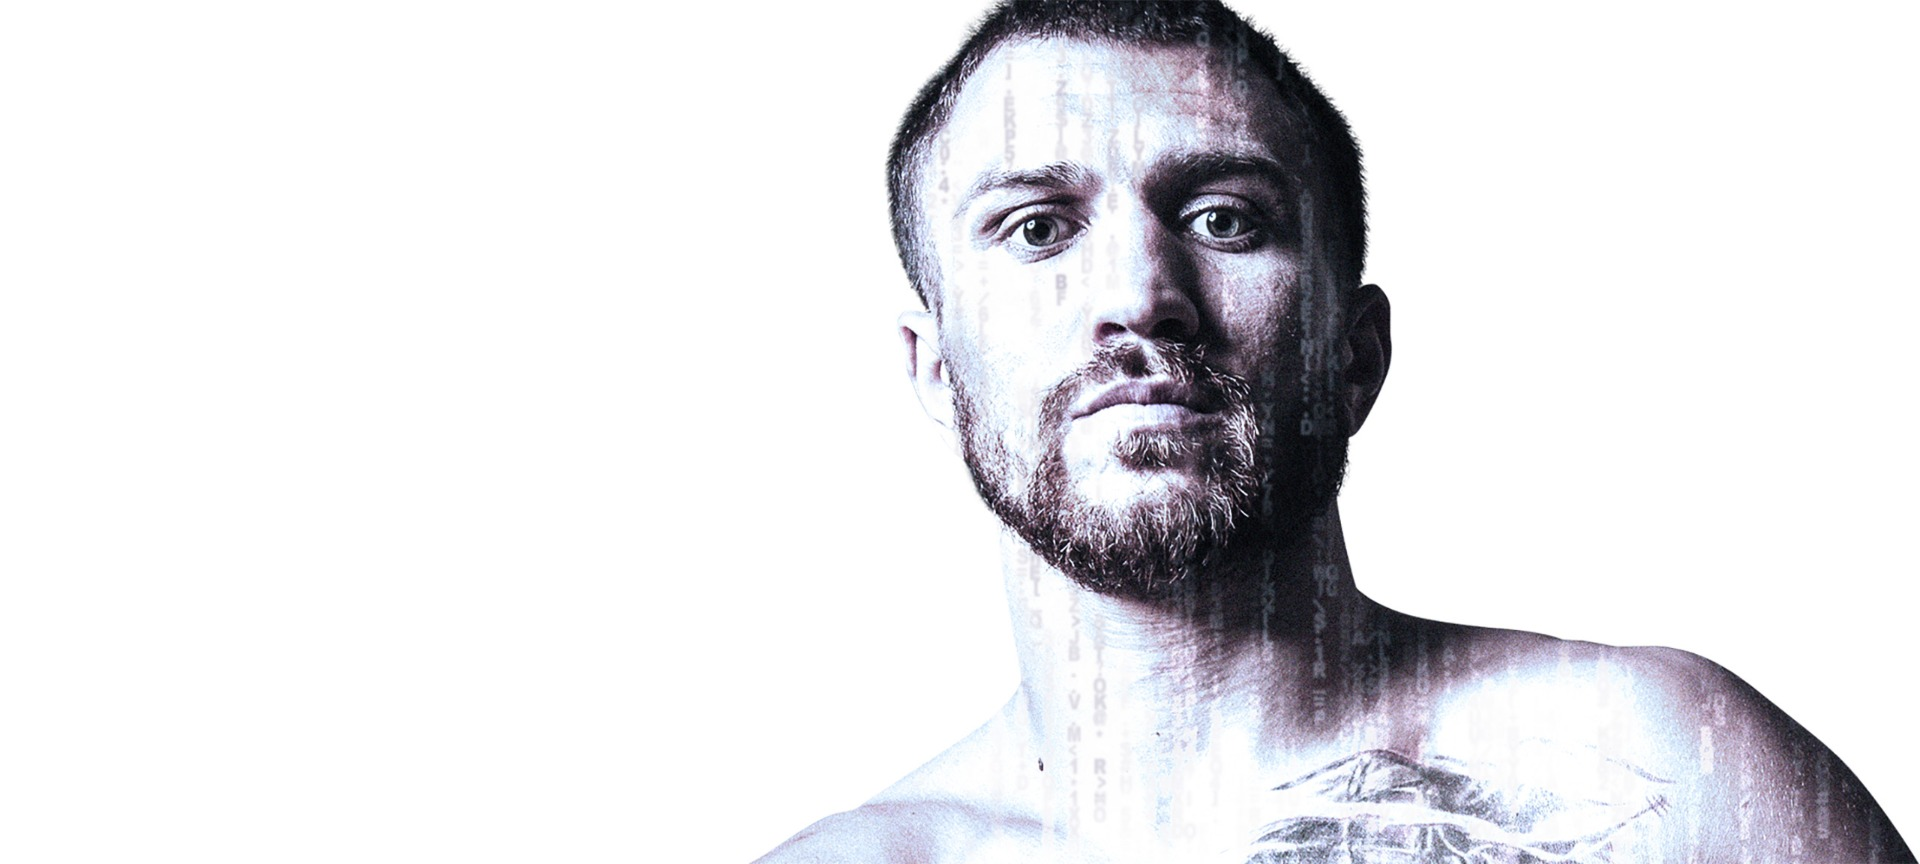 Vasyl Lomachenko Hi-Tech Ukraine Boxer World Champion Boxing T-Shirt